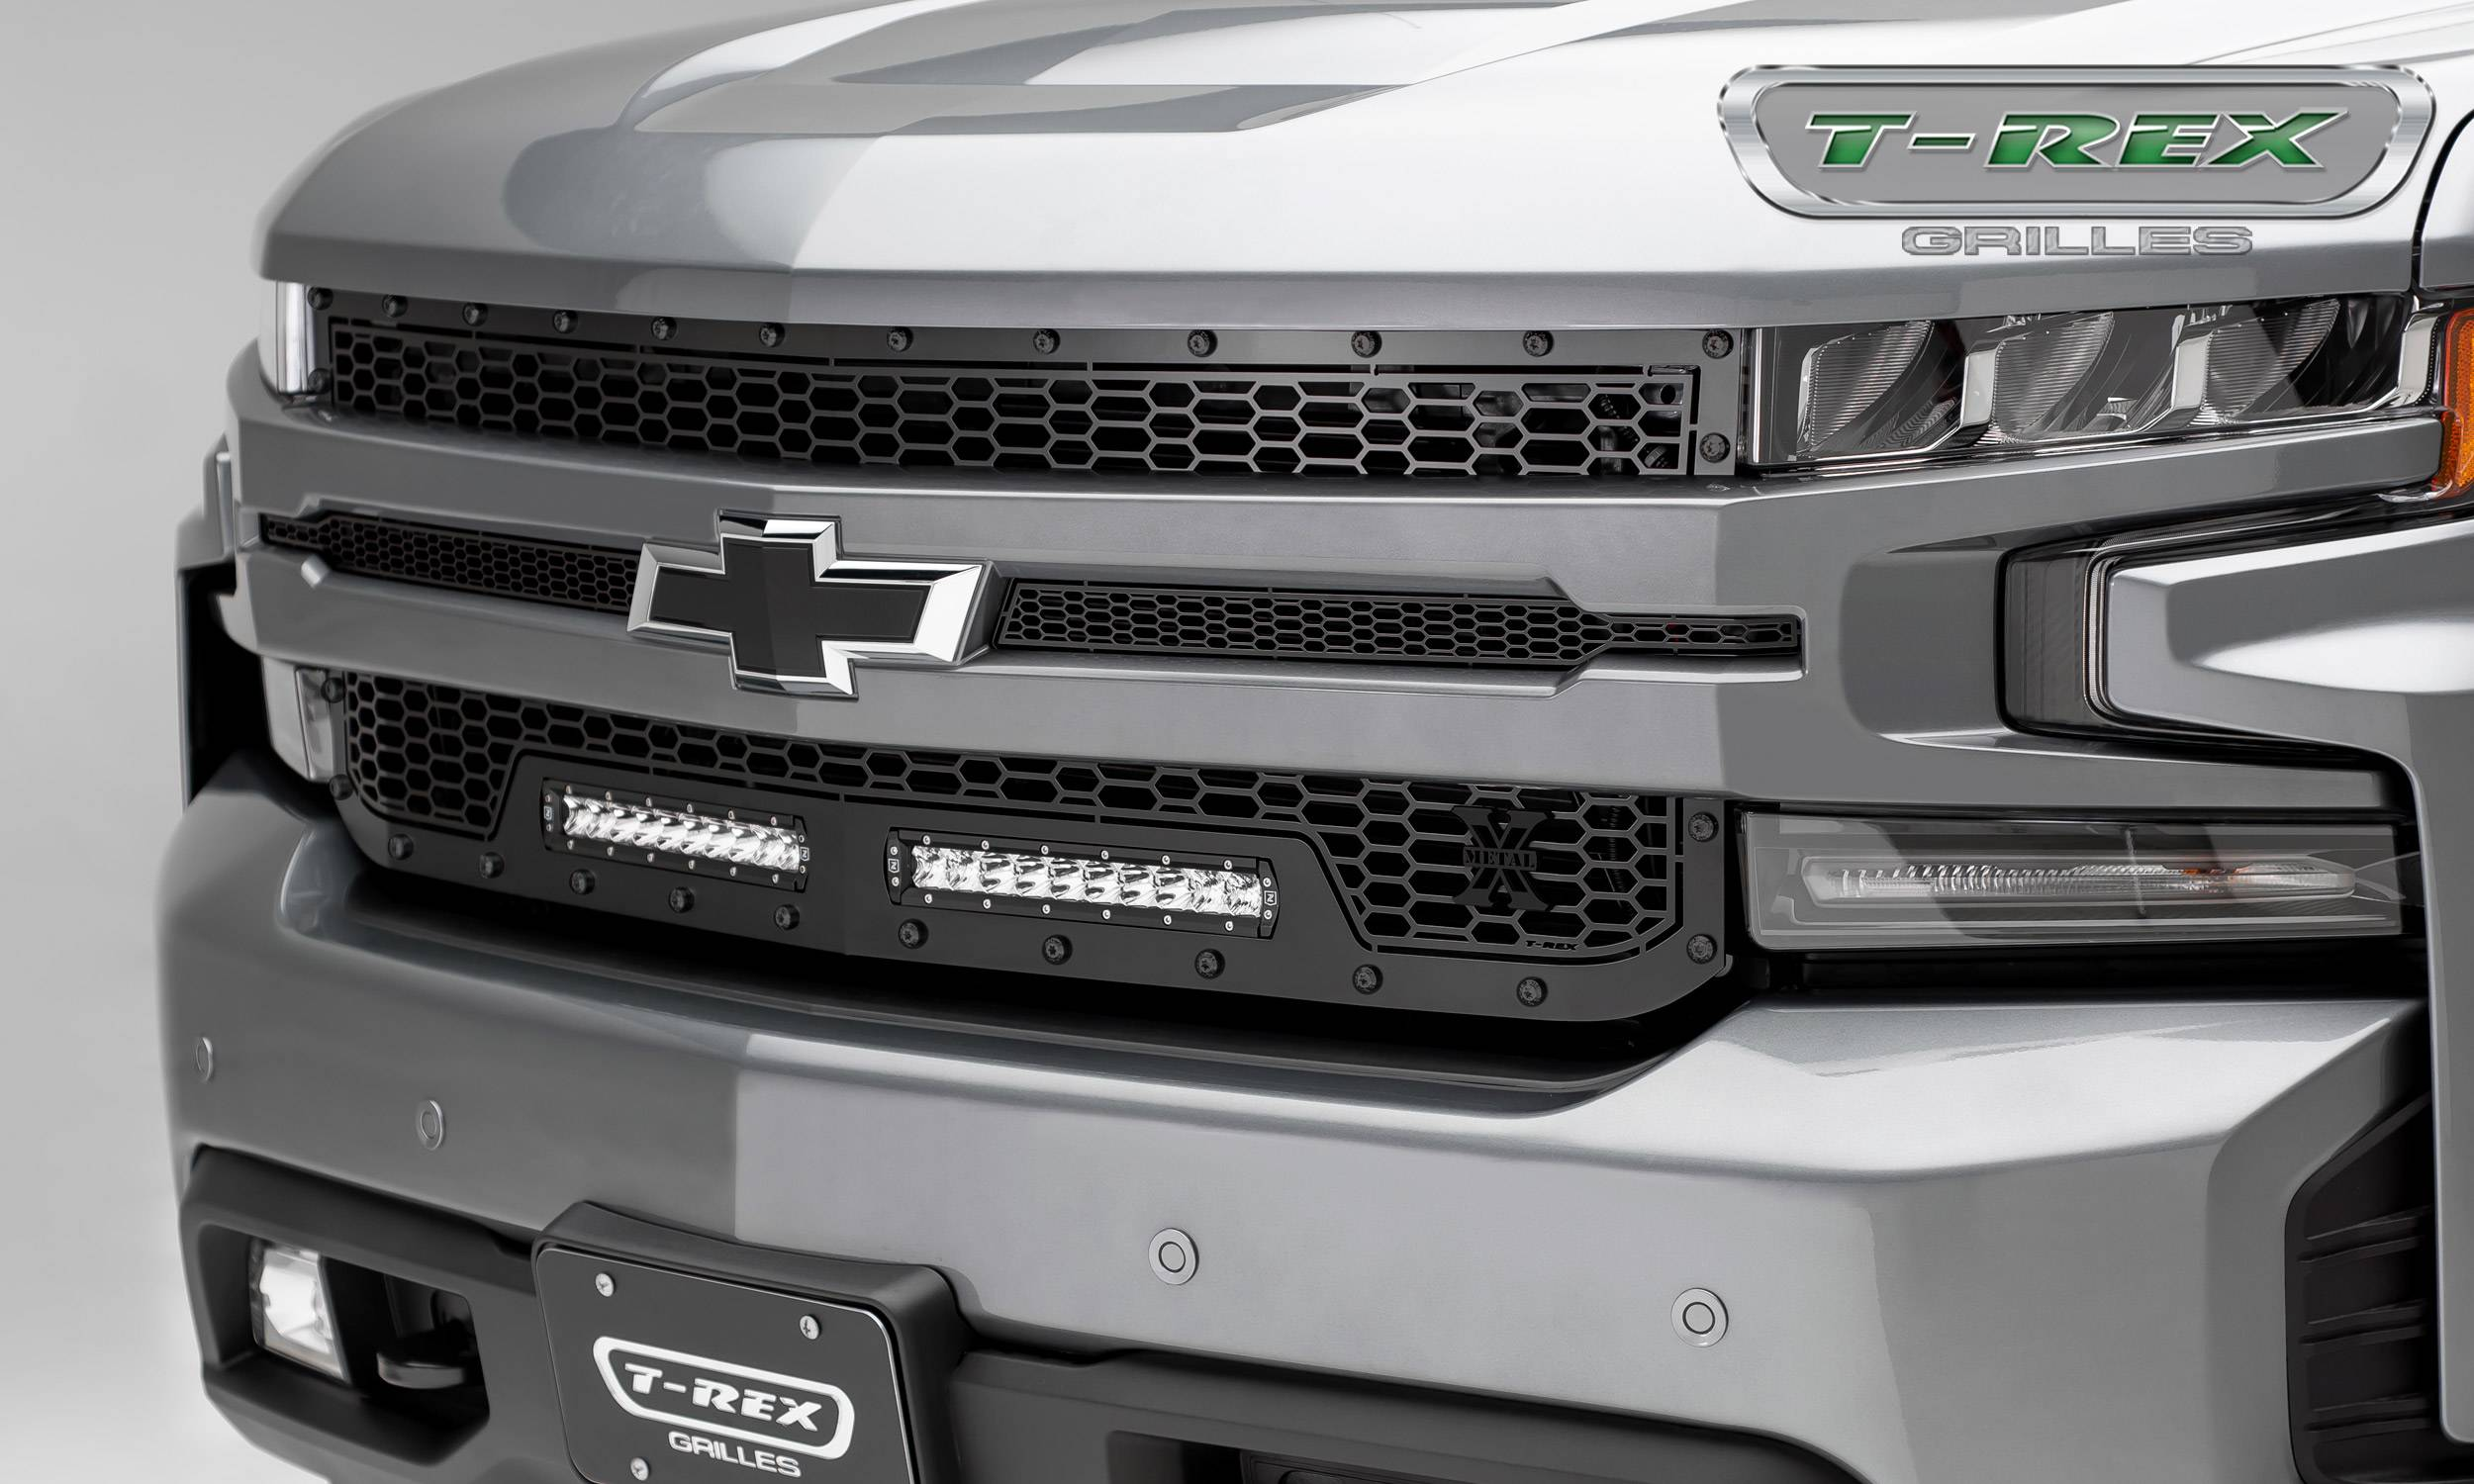 T-REX Grilles - Chevrolet Silverado 1500 2019 Stealth Laser Torch Grille, Black, Mild Steel, 1 Pc, Replacement - Pt #7311261-BR